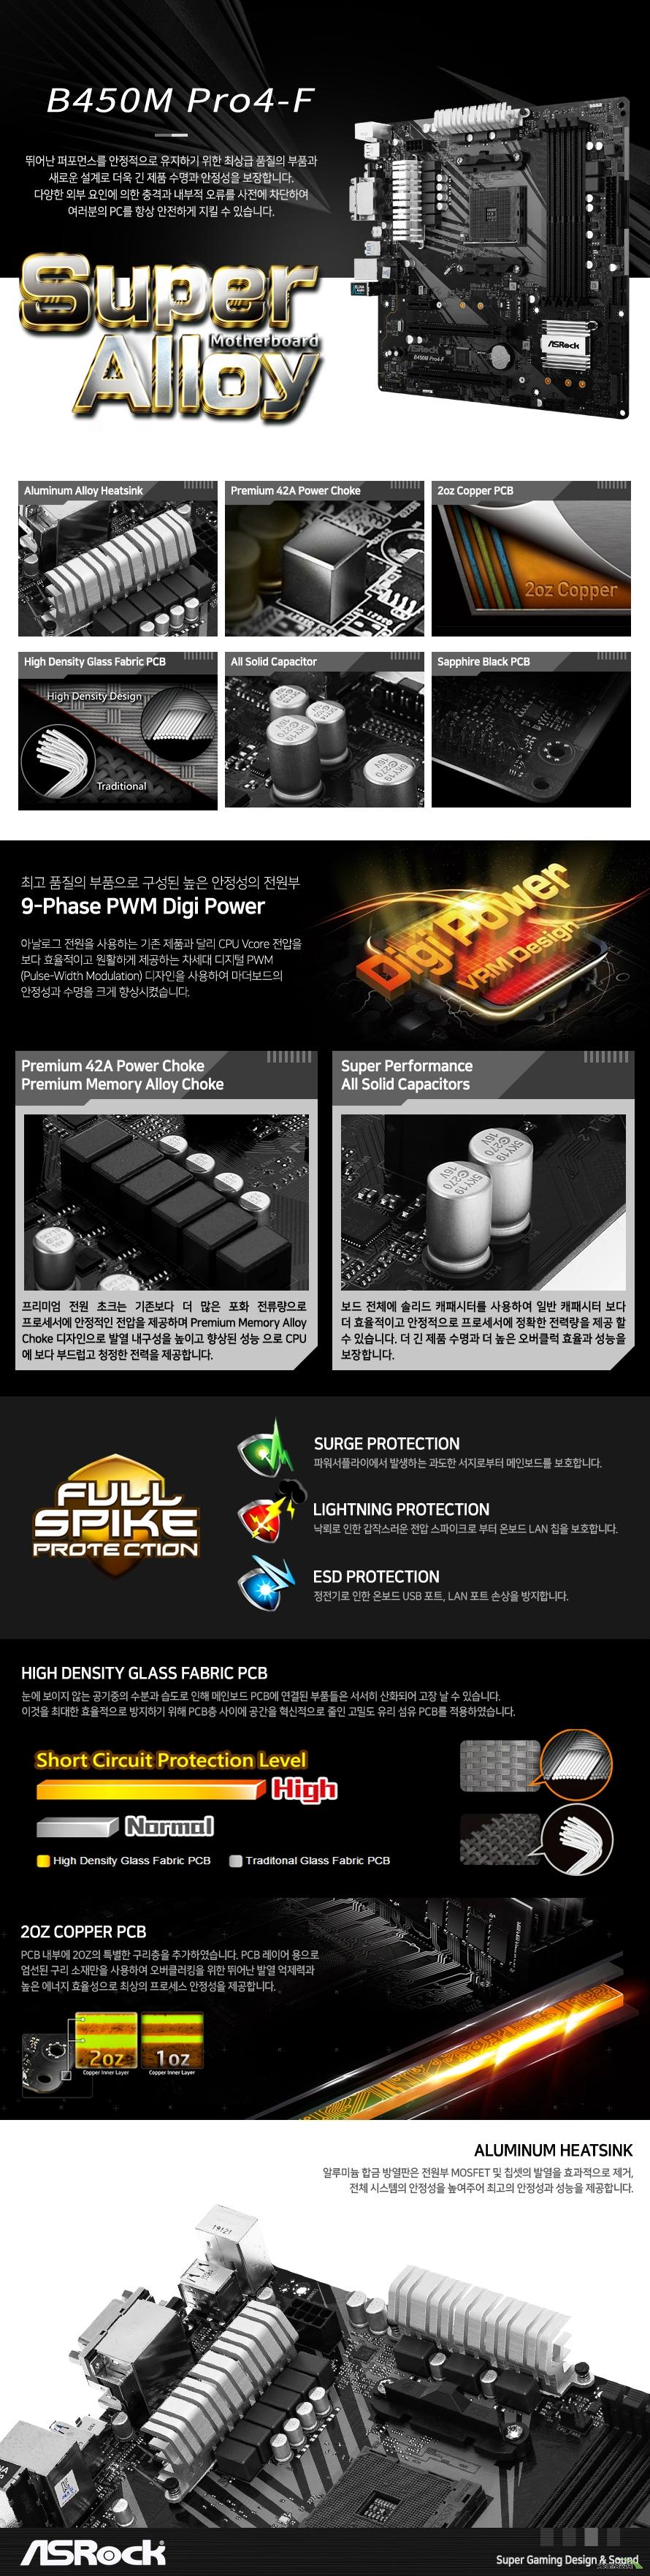 ASRock  B450M PRO4-F 디앤디컴